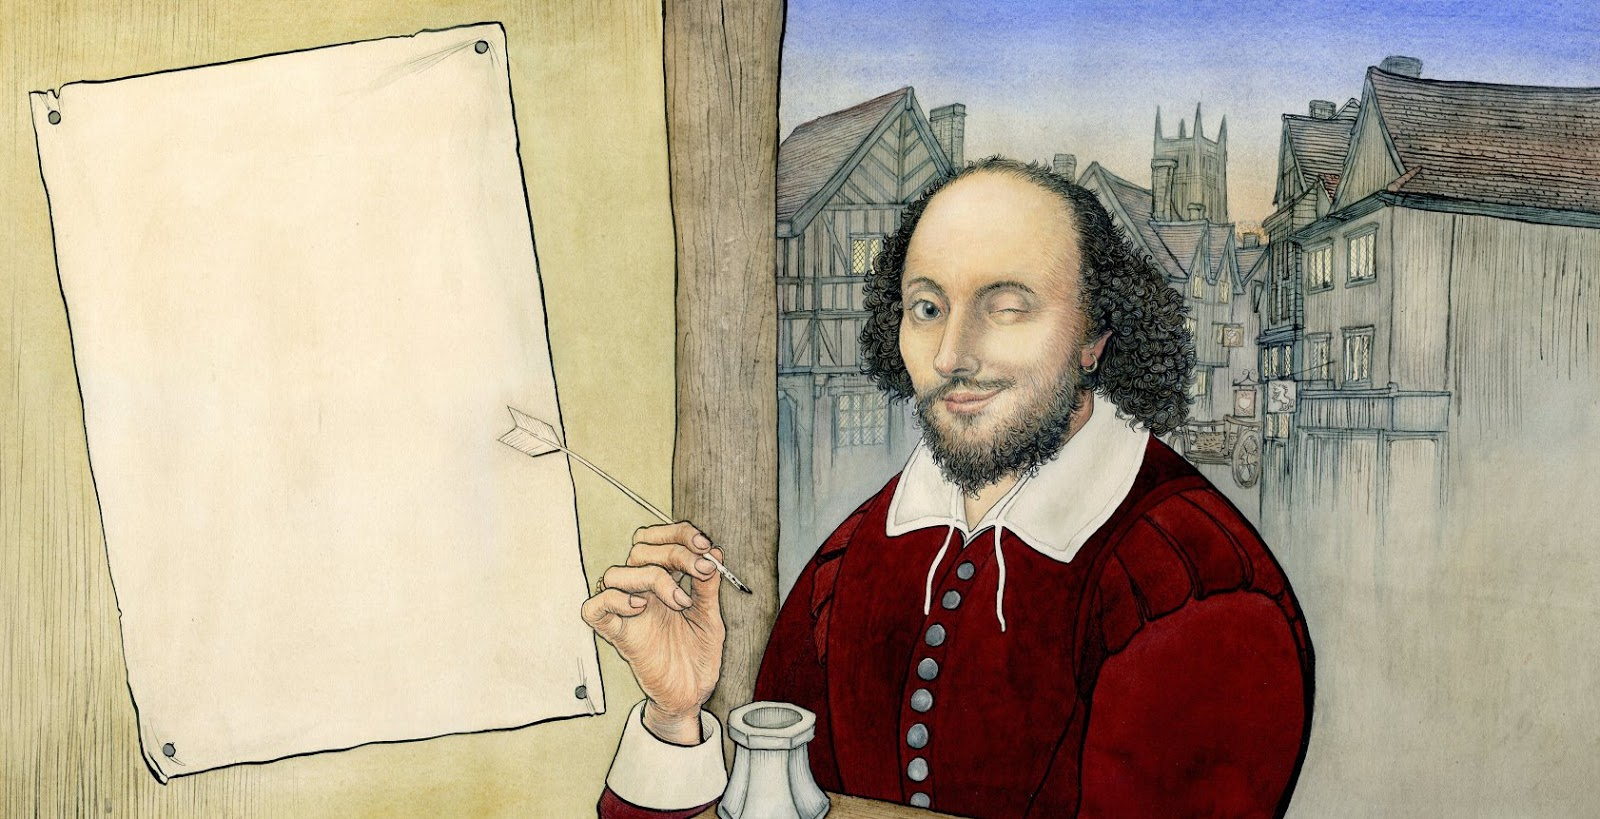 Иллюстрация Джона Стенли в книге «Shakespeare for children and their parents»